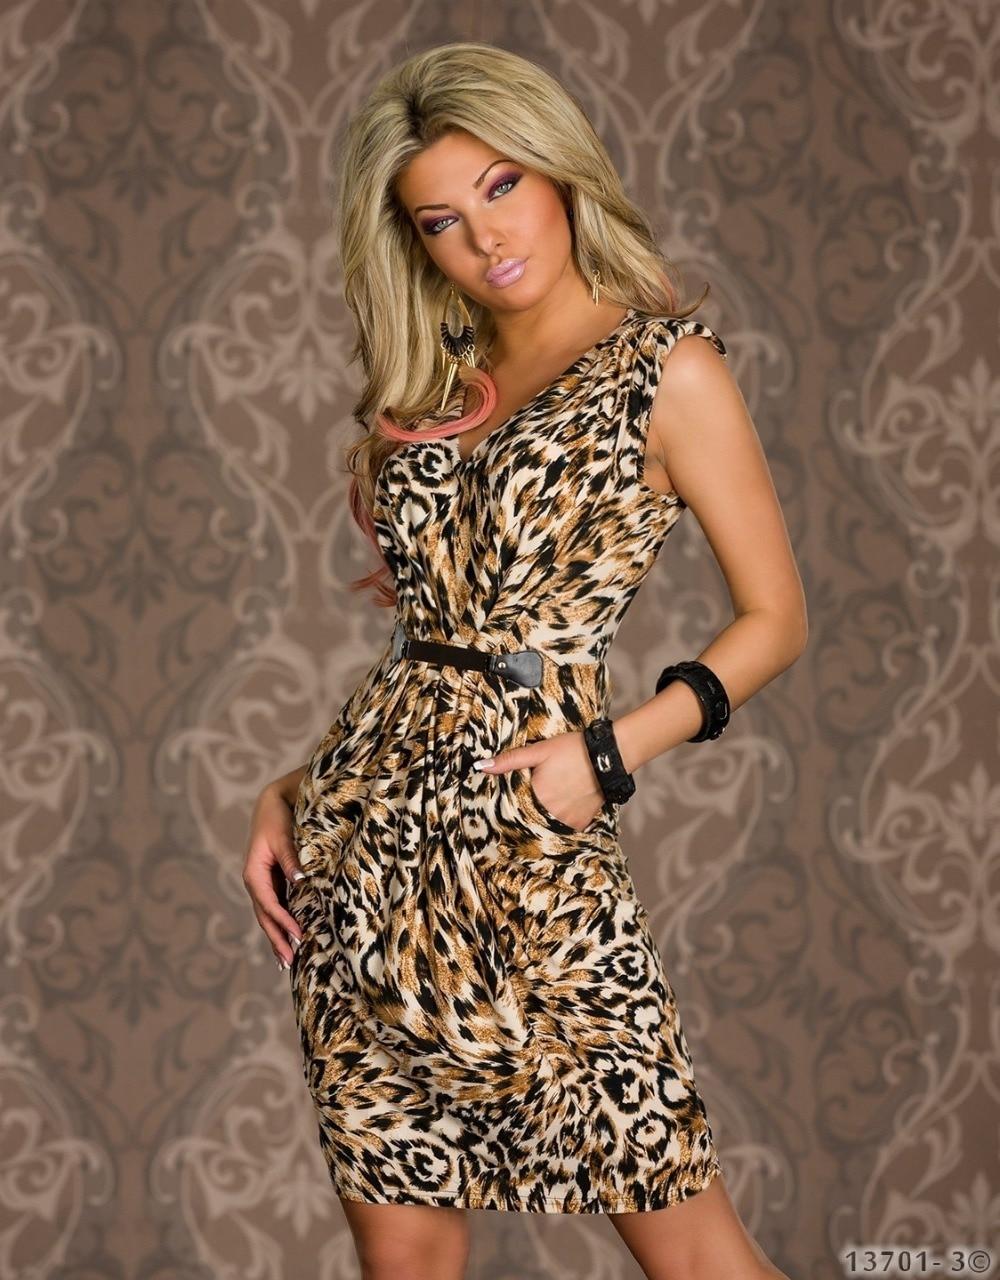 065359b2afca2a New Fashion Vestidos De Festa Women Leopard Print Sleeveless Knee-Length  Dress Vintage Summer Casual Dress Sexy Club Dress 0455